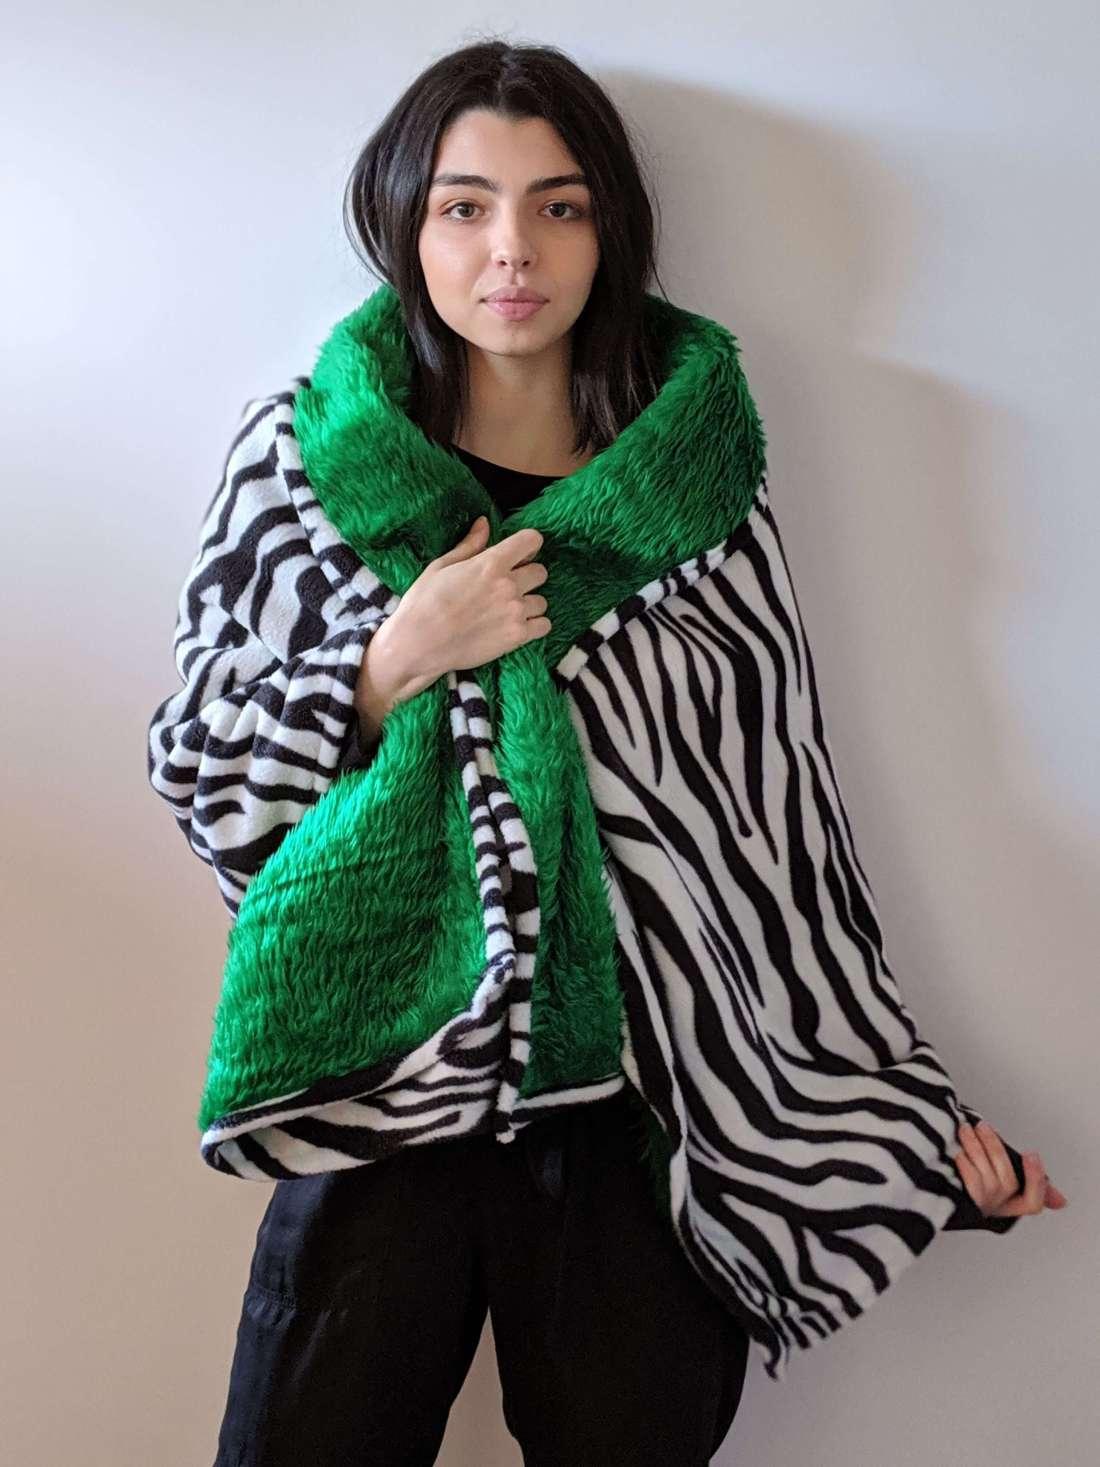 zebra shawl with green fur